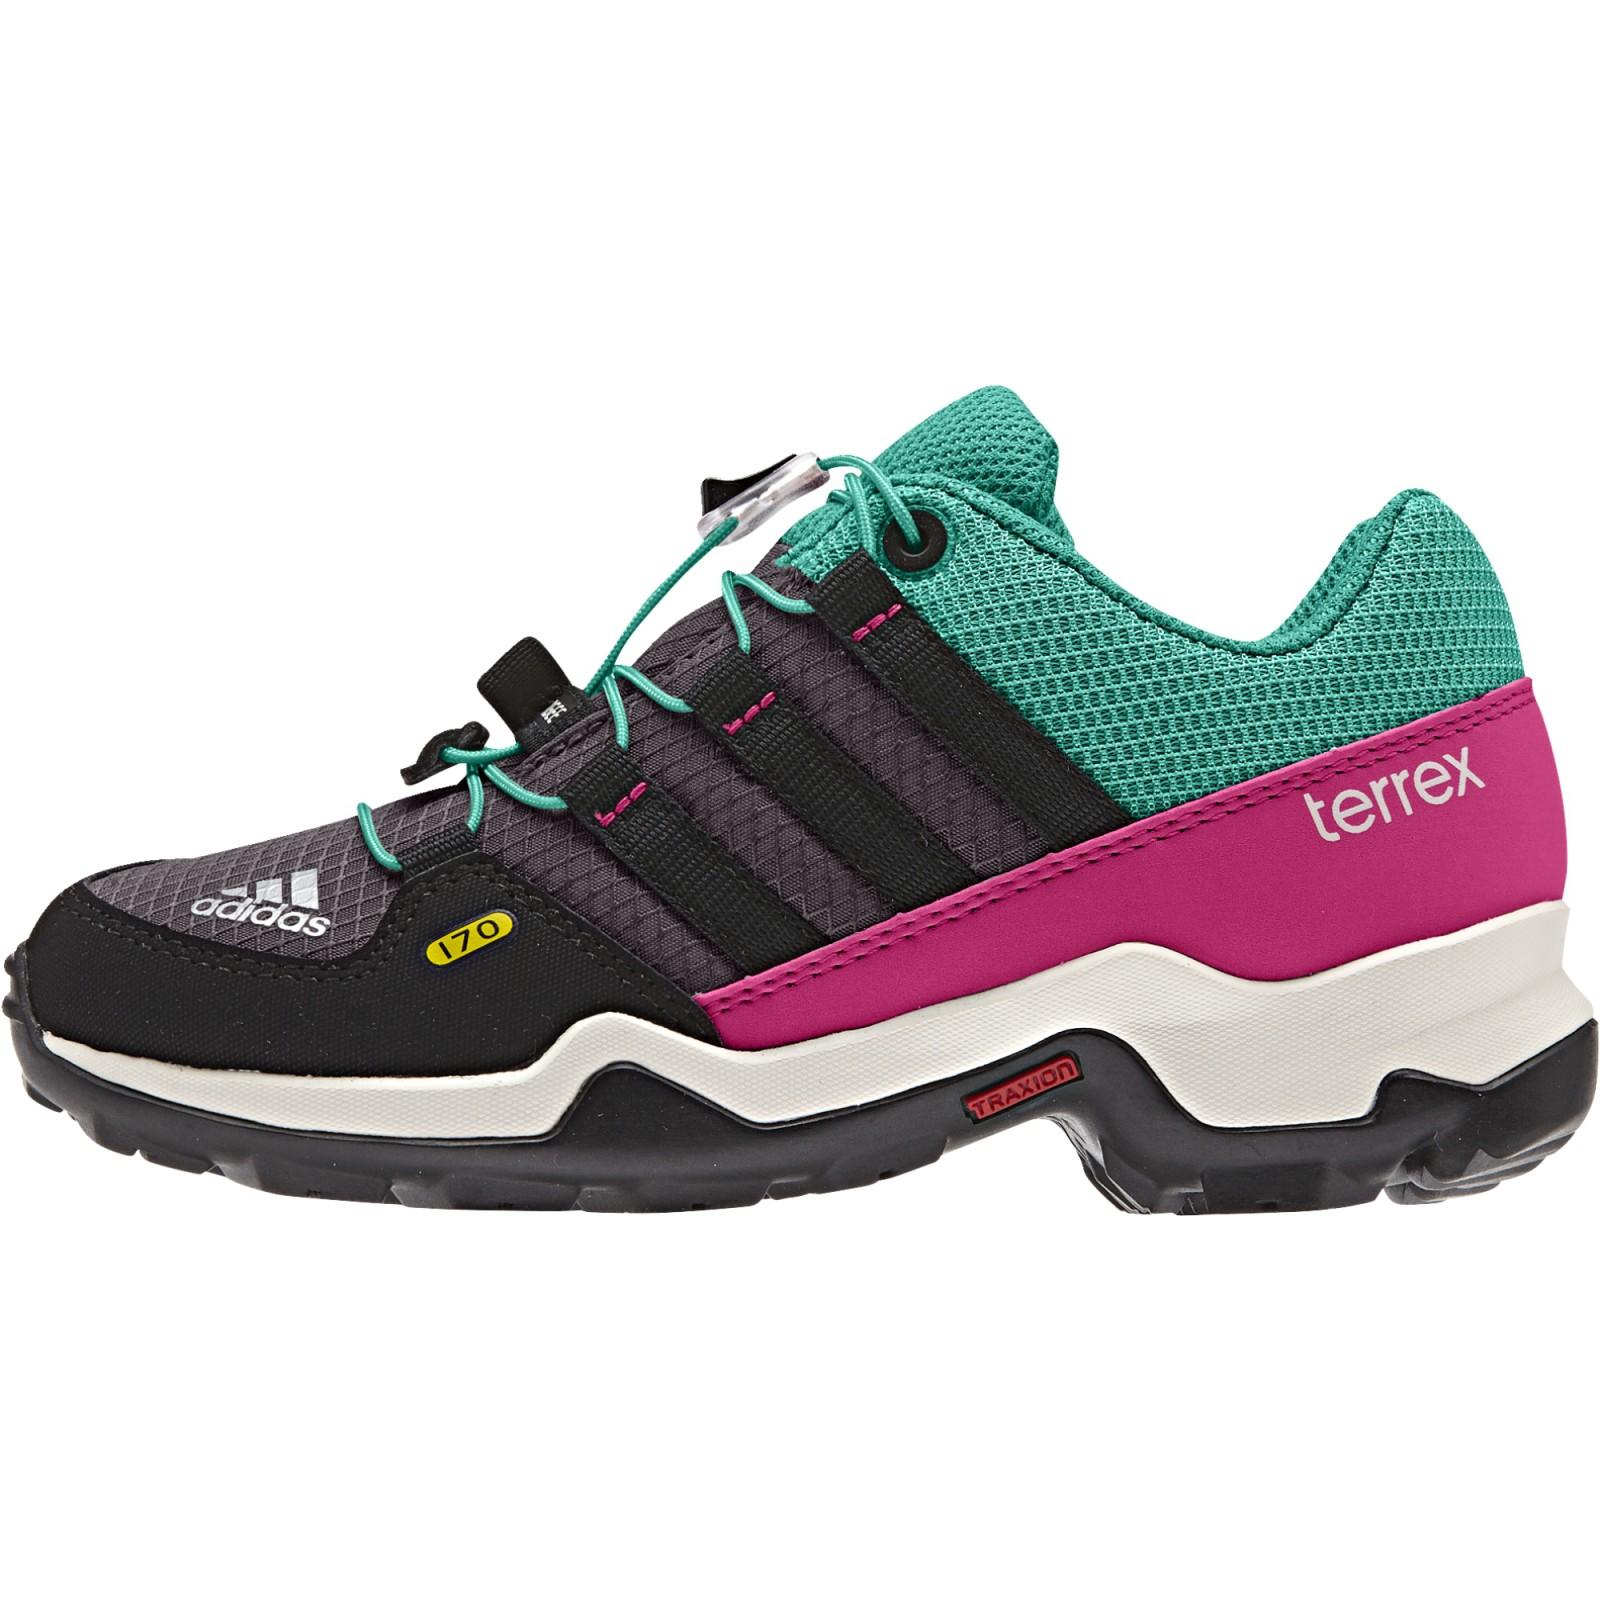 10381ec221f Dětská treková obuv adidas TERREX K